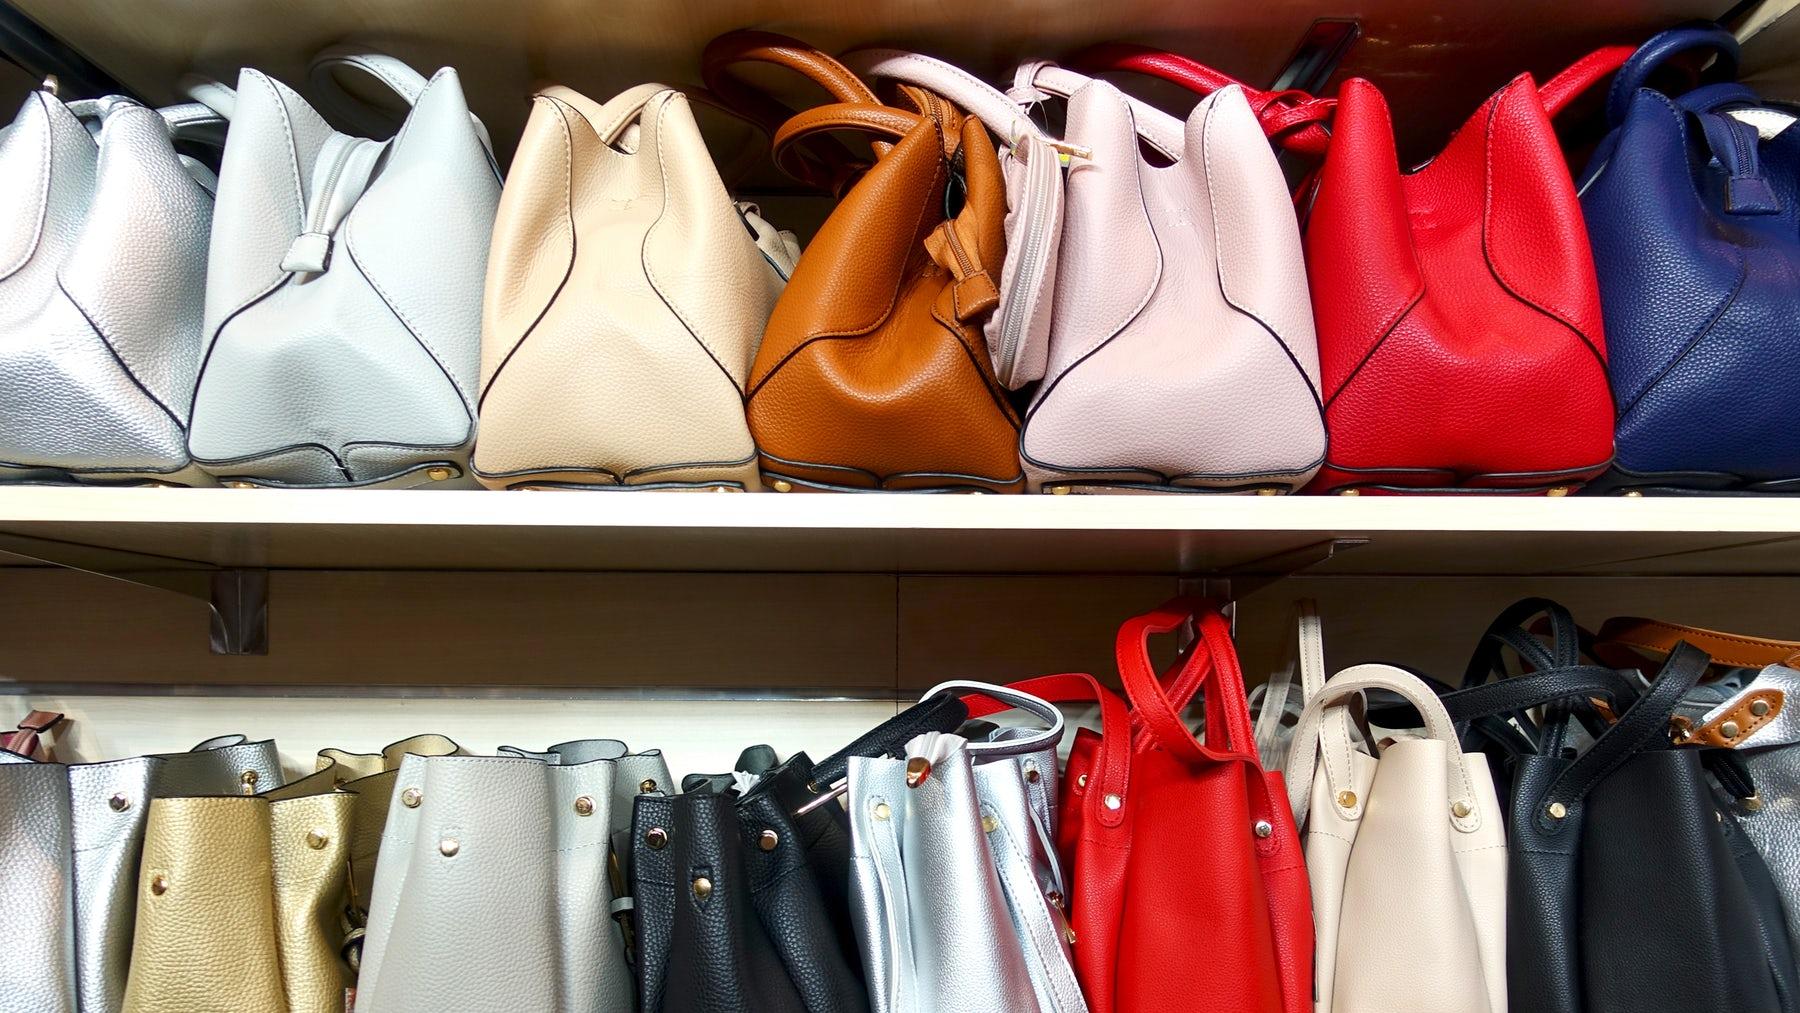 Fashion's Dirty Secret: Millions in Grey Market Sales